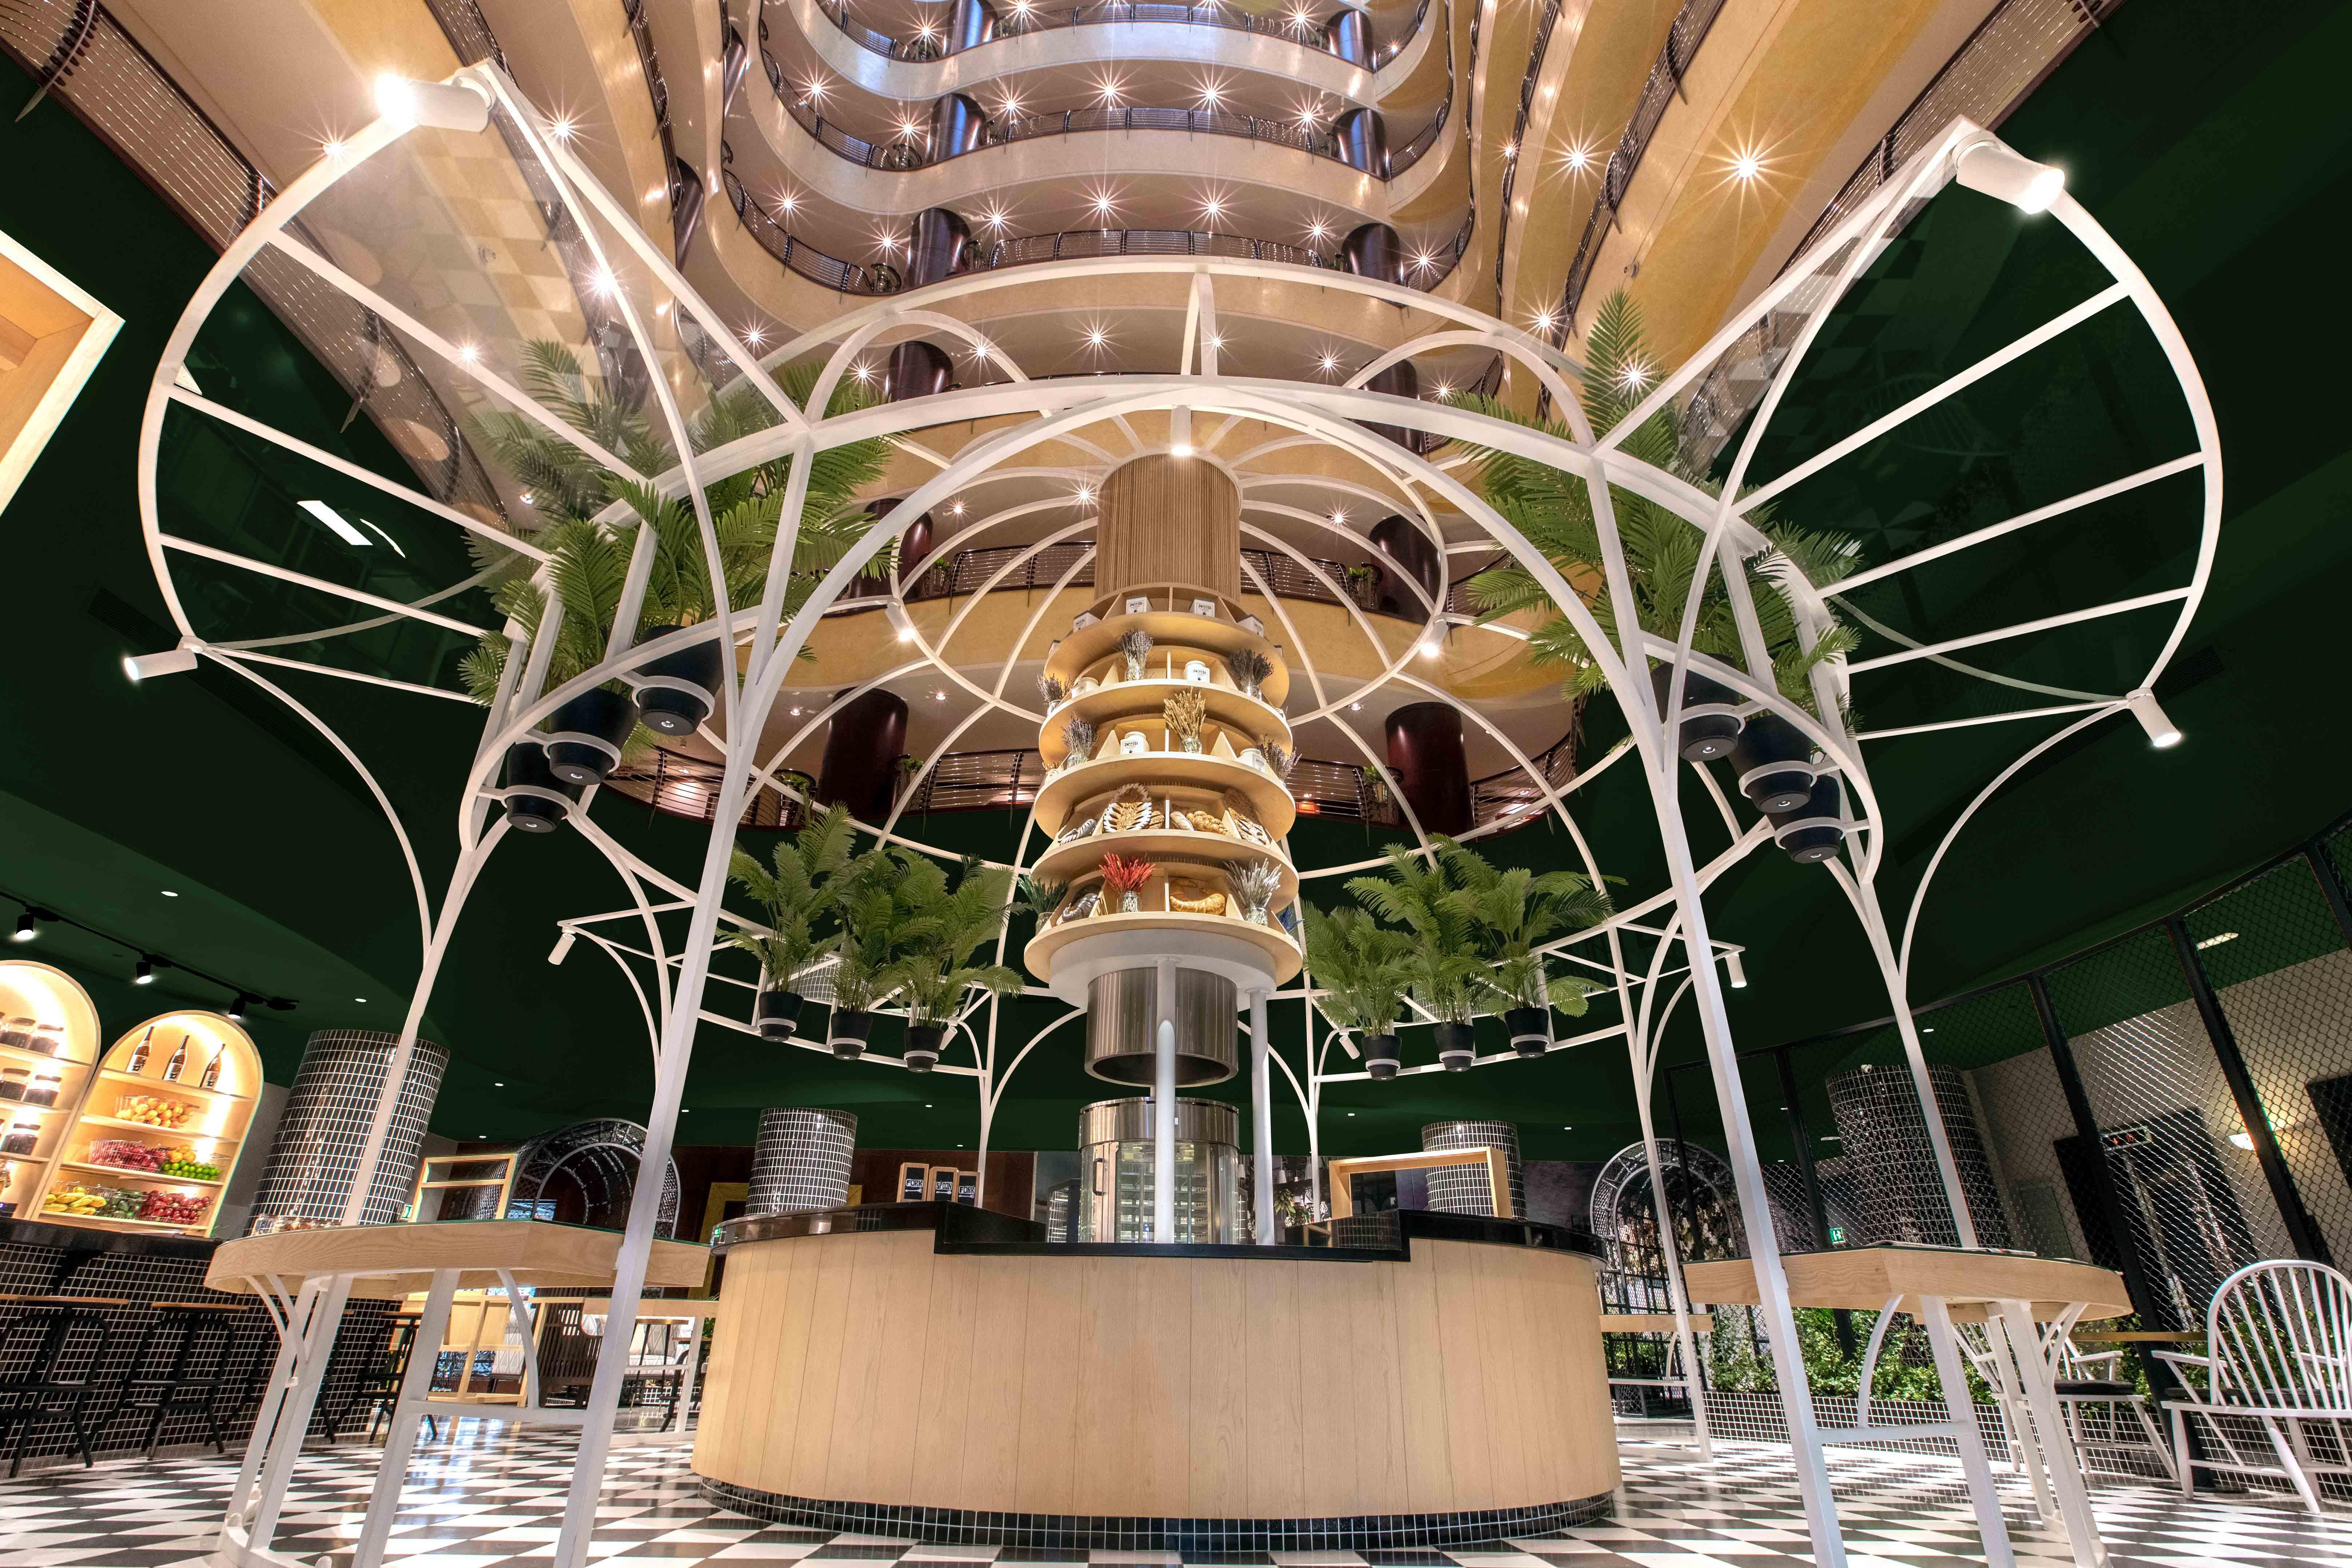 Creneau Interior Design Agency Dubai Middle East Dusit Thani Hotel Lobby